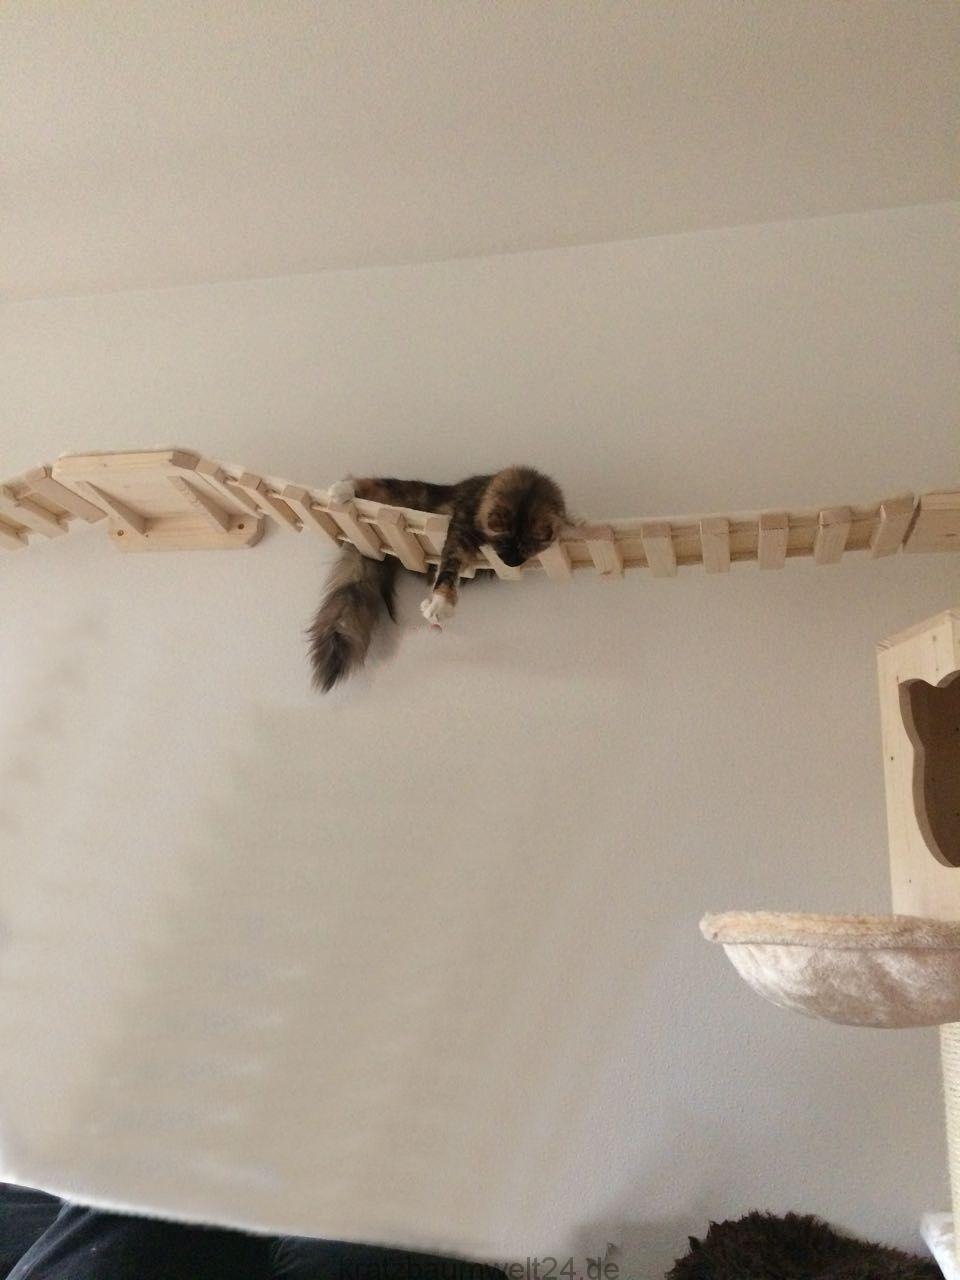 h ngebr cke f r katzen catwalk f r katzen kratzbaum gross. Black Bedroom Furniture Sets. Home Design Ideas